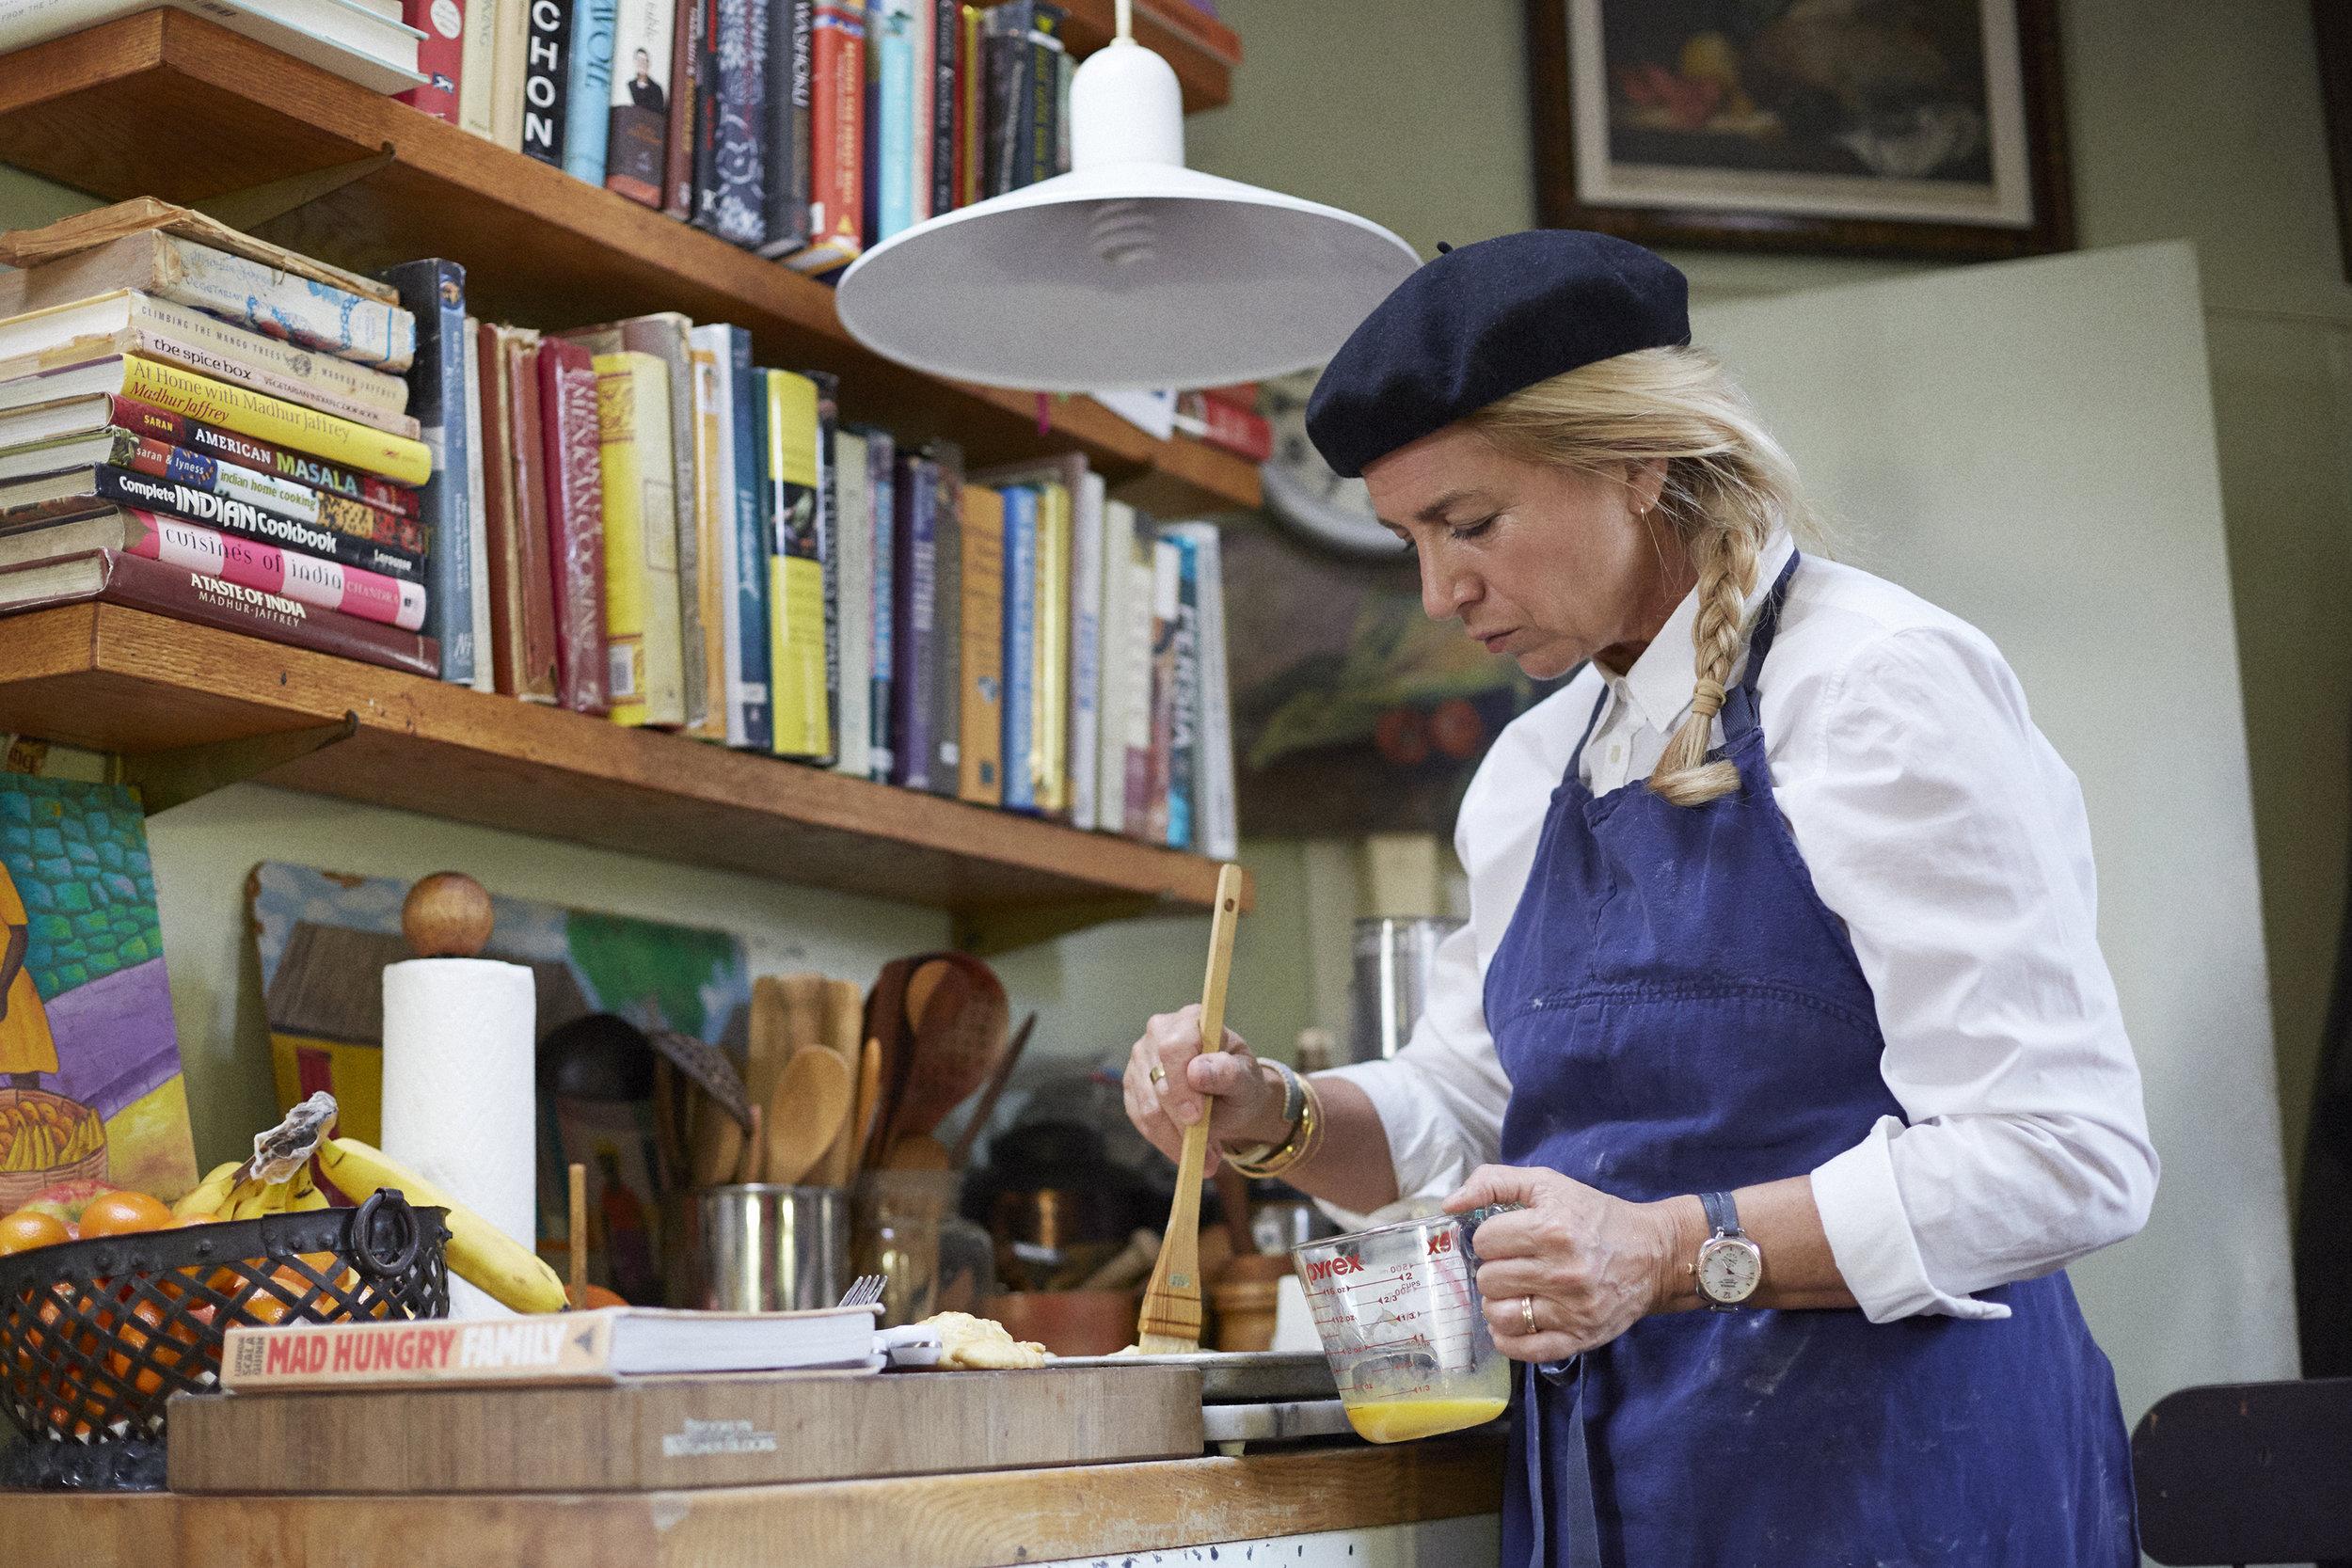 Lucinda prepares apple pocket pies in her kitchen.